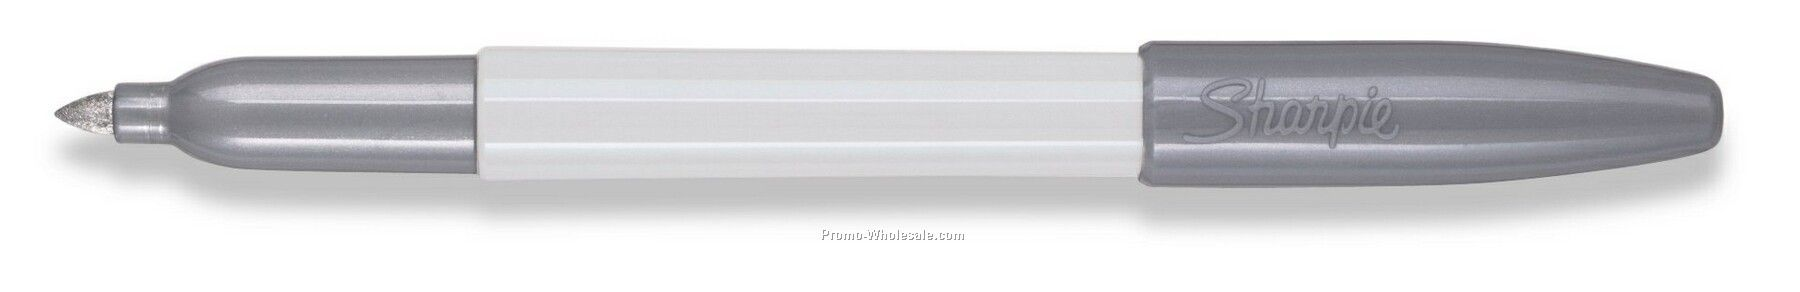 Sharpie Metallic Silver Permanent Marker